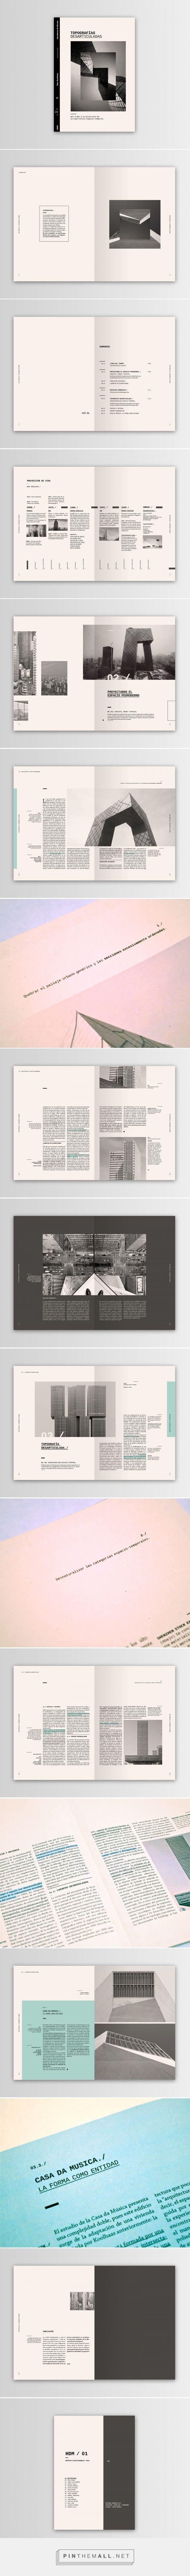 Rem Koolhaas Pressbook on Behance